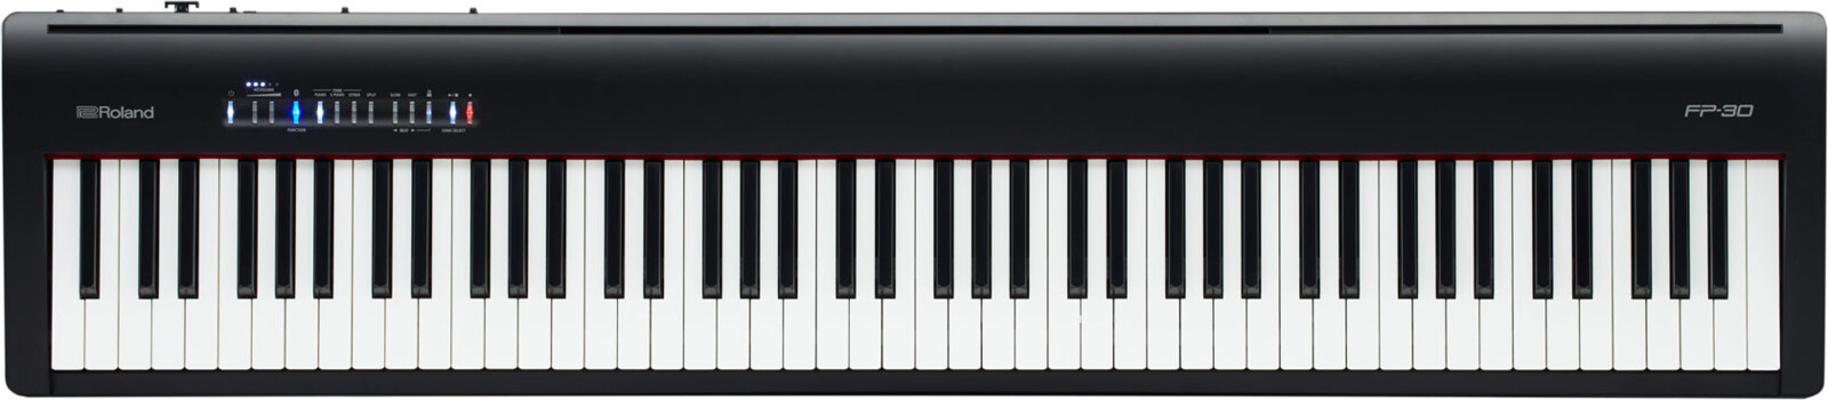 Roland FP-30X-BK Digital Piano Black